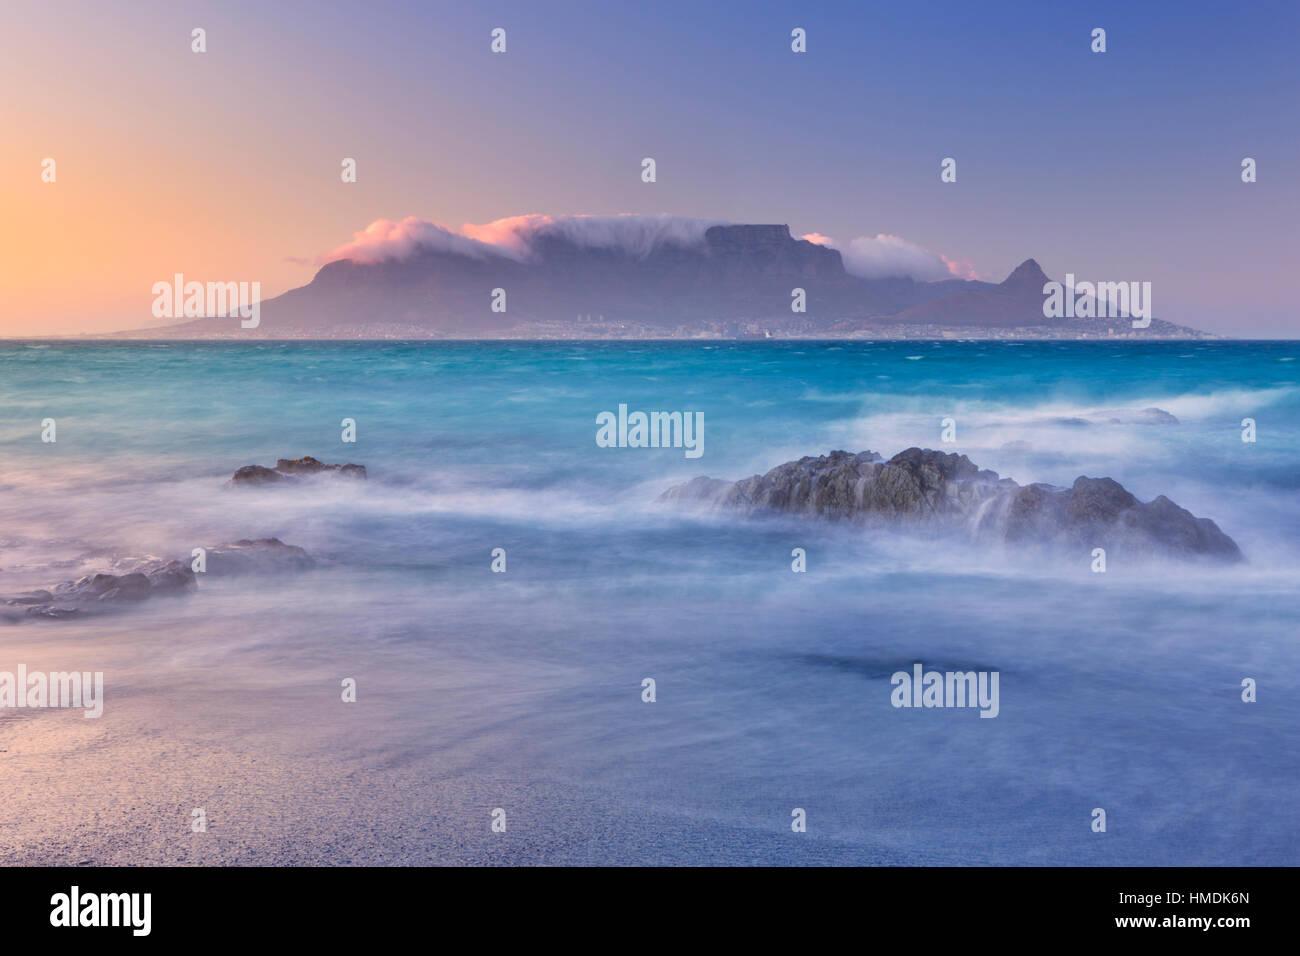 Sonnenaufgang über dem Tafelberg und Kapstadt vom Strand Bloubergstrand. Stockbild